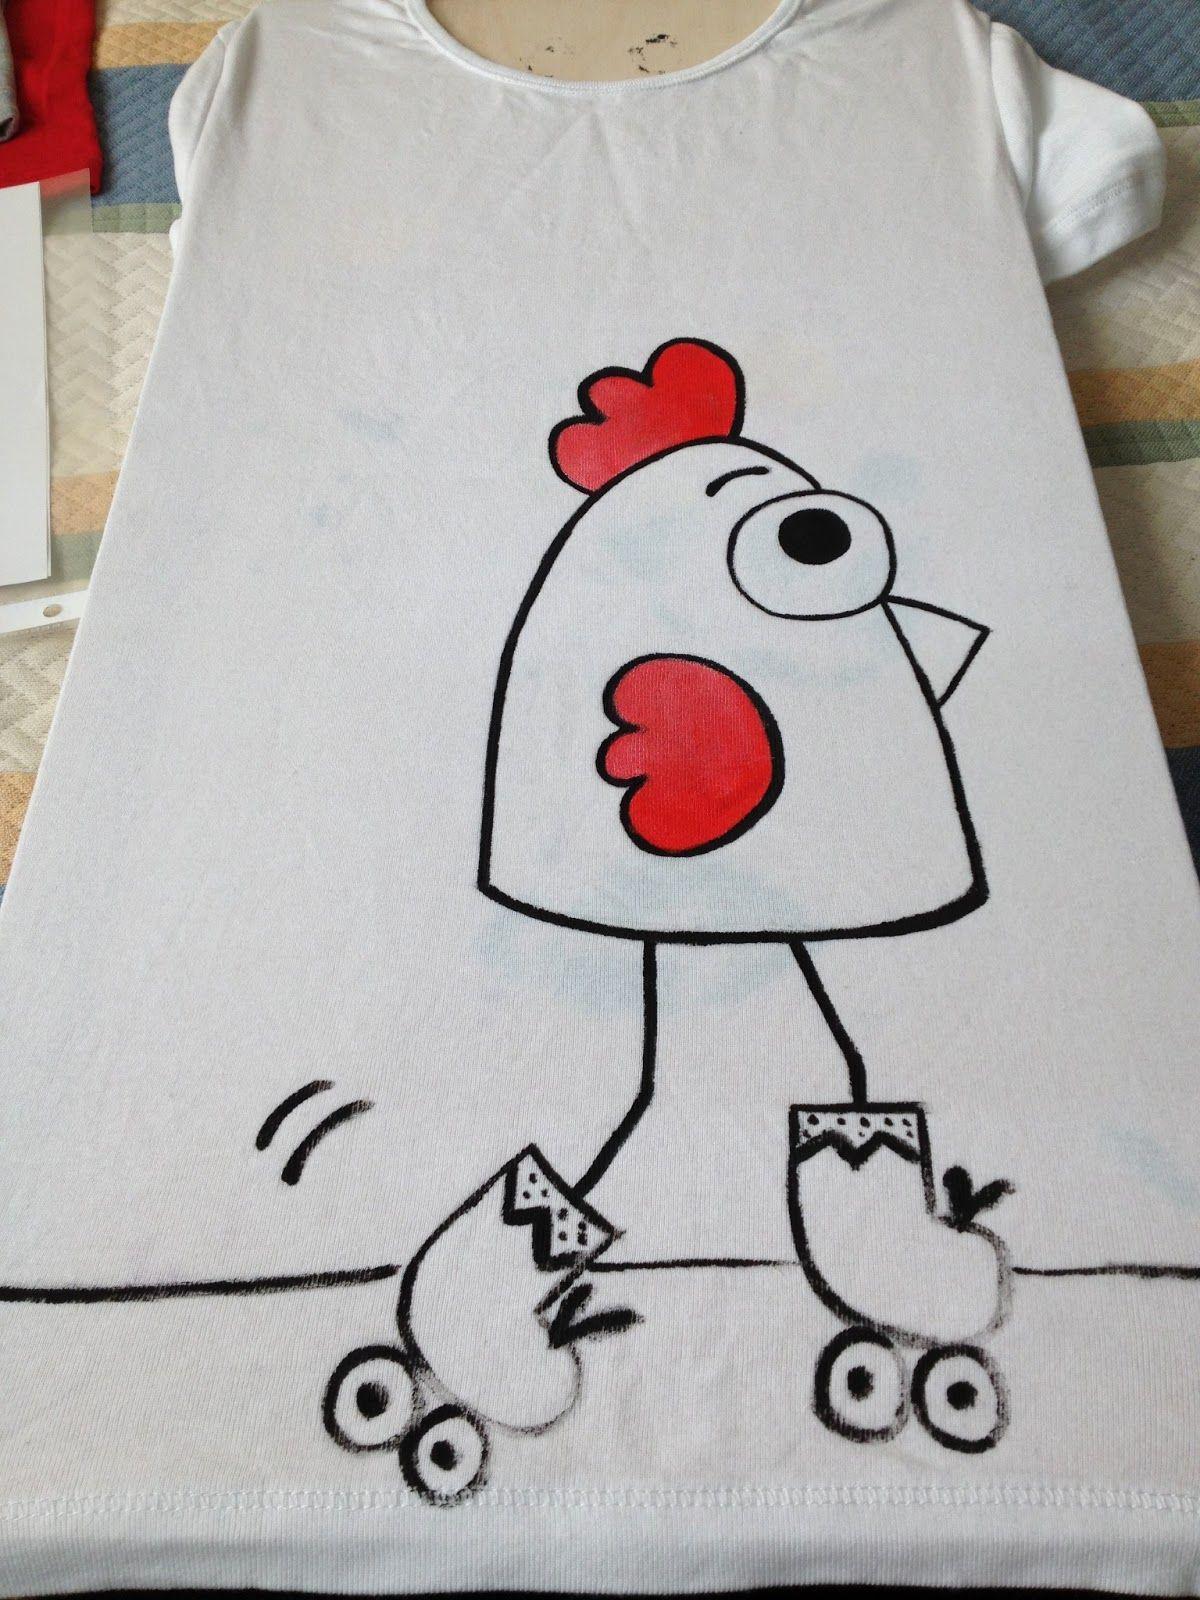 Plantillas para pintar camisetas con rotuladores buscar - Pintar camisetas ninos ...